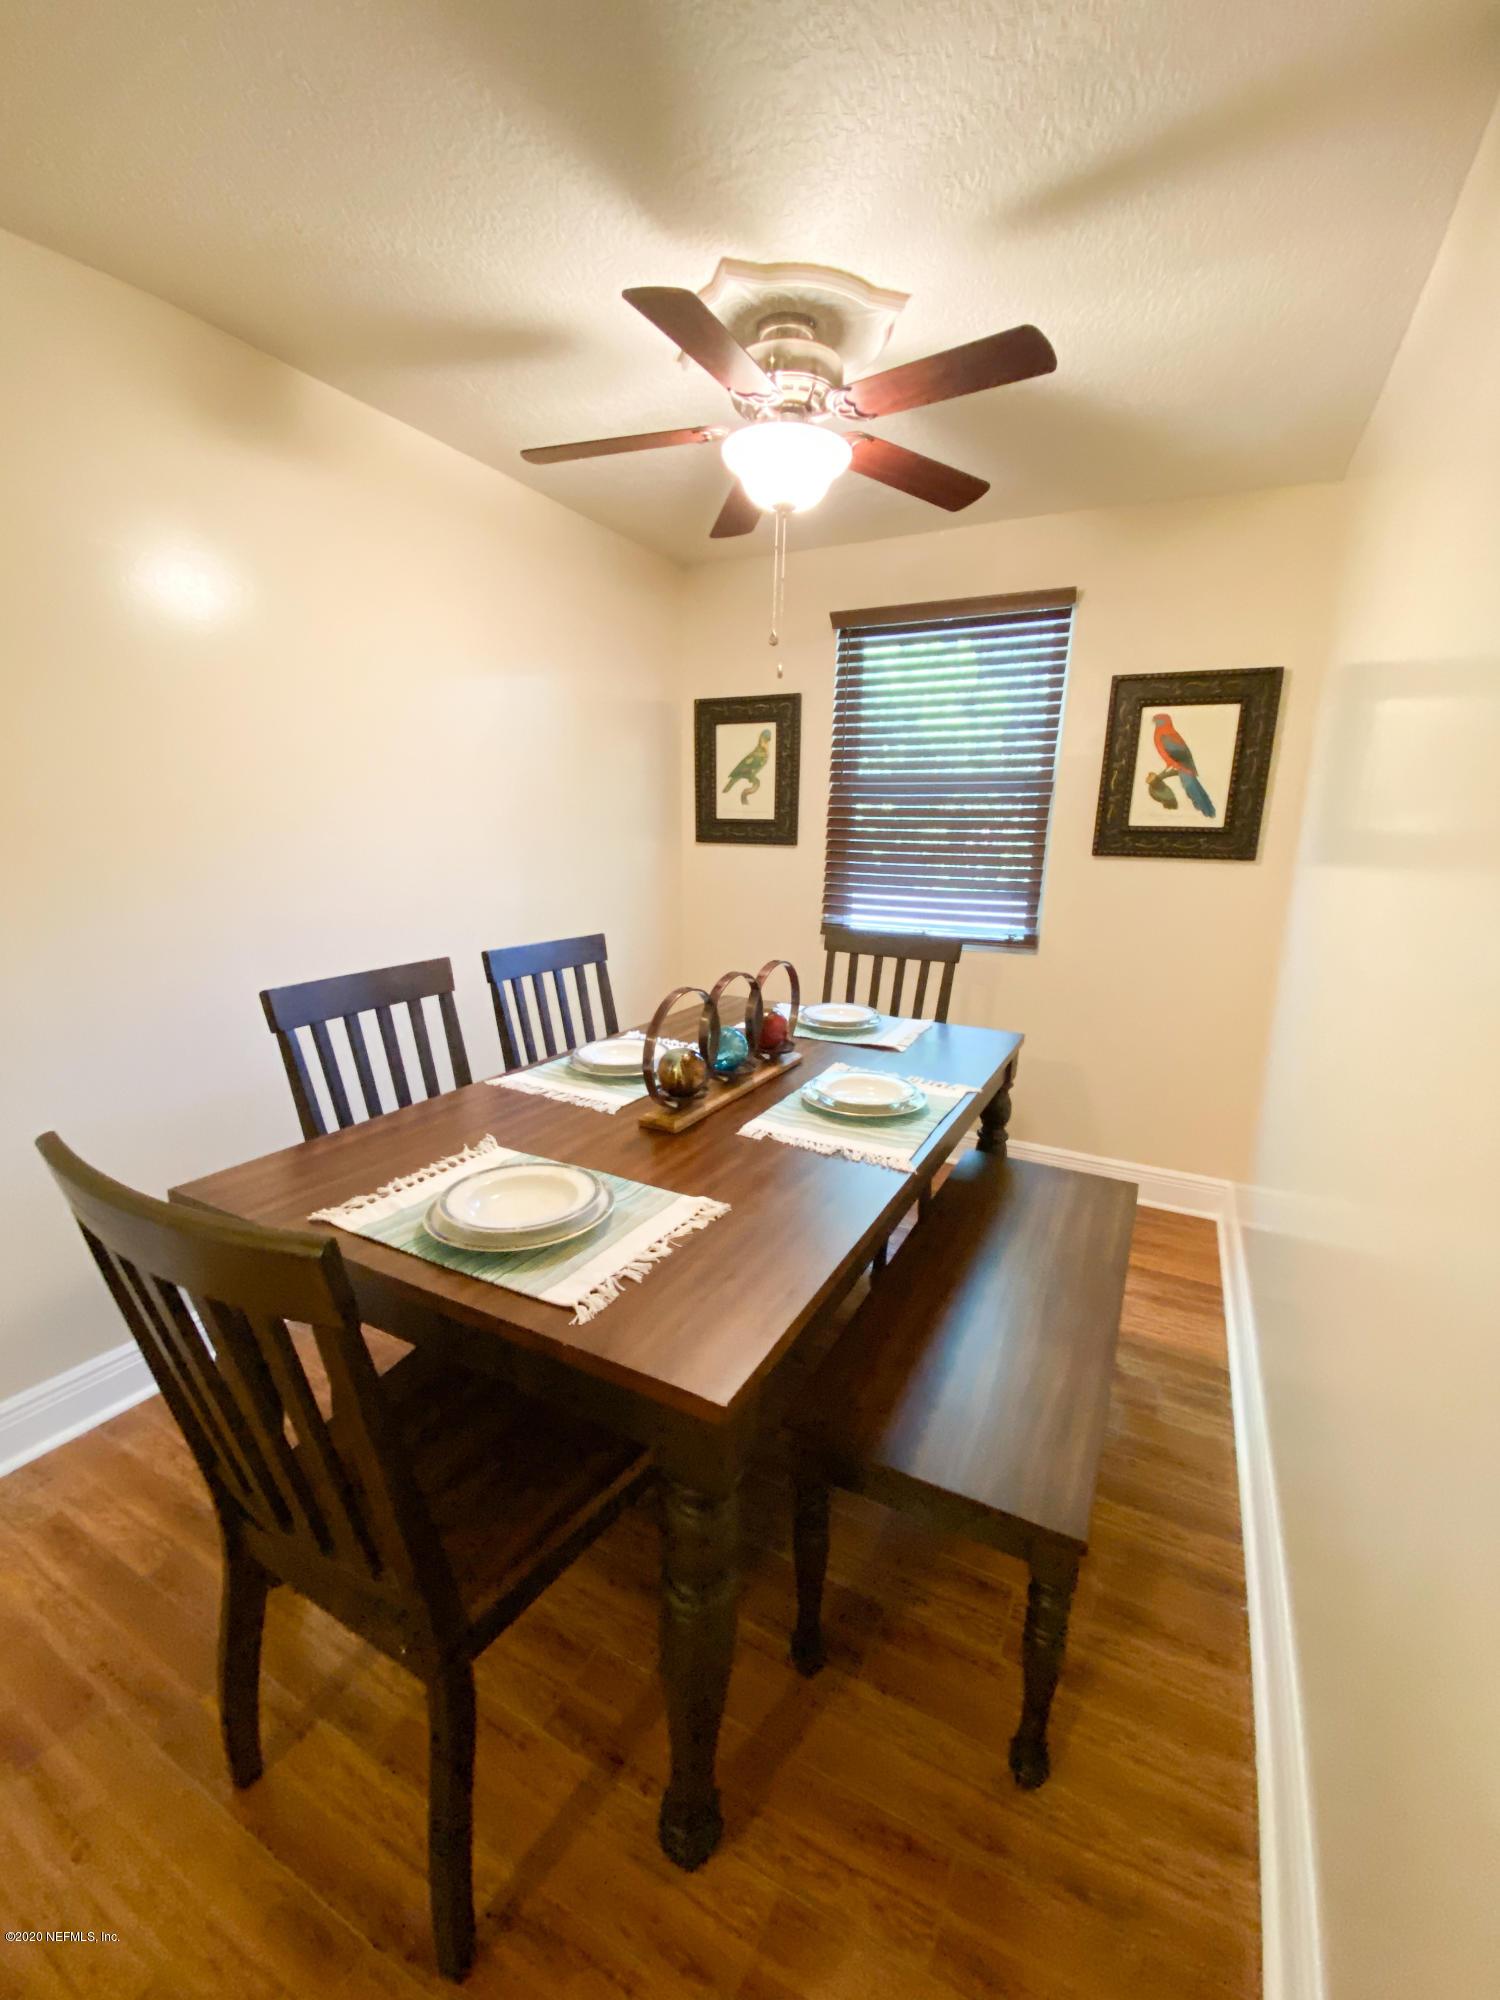 4024 HUNTER, JACKSONVILLE, FLORIDA 32207, 2 Bedrooms Bedrooms, ,1 BathroomBathrooms,Residential,For sale,HUNTER,1047423